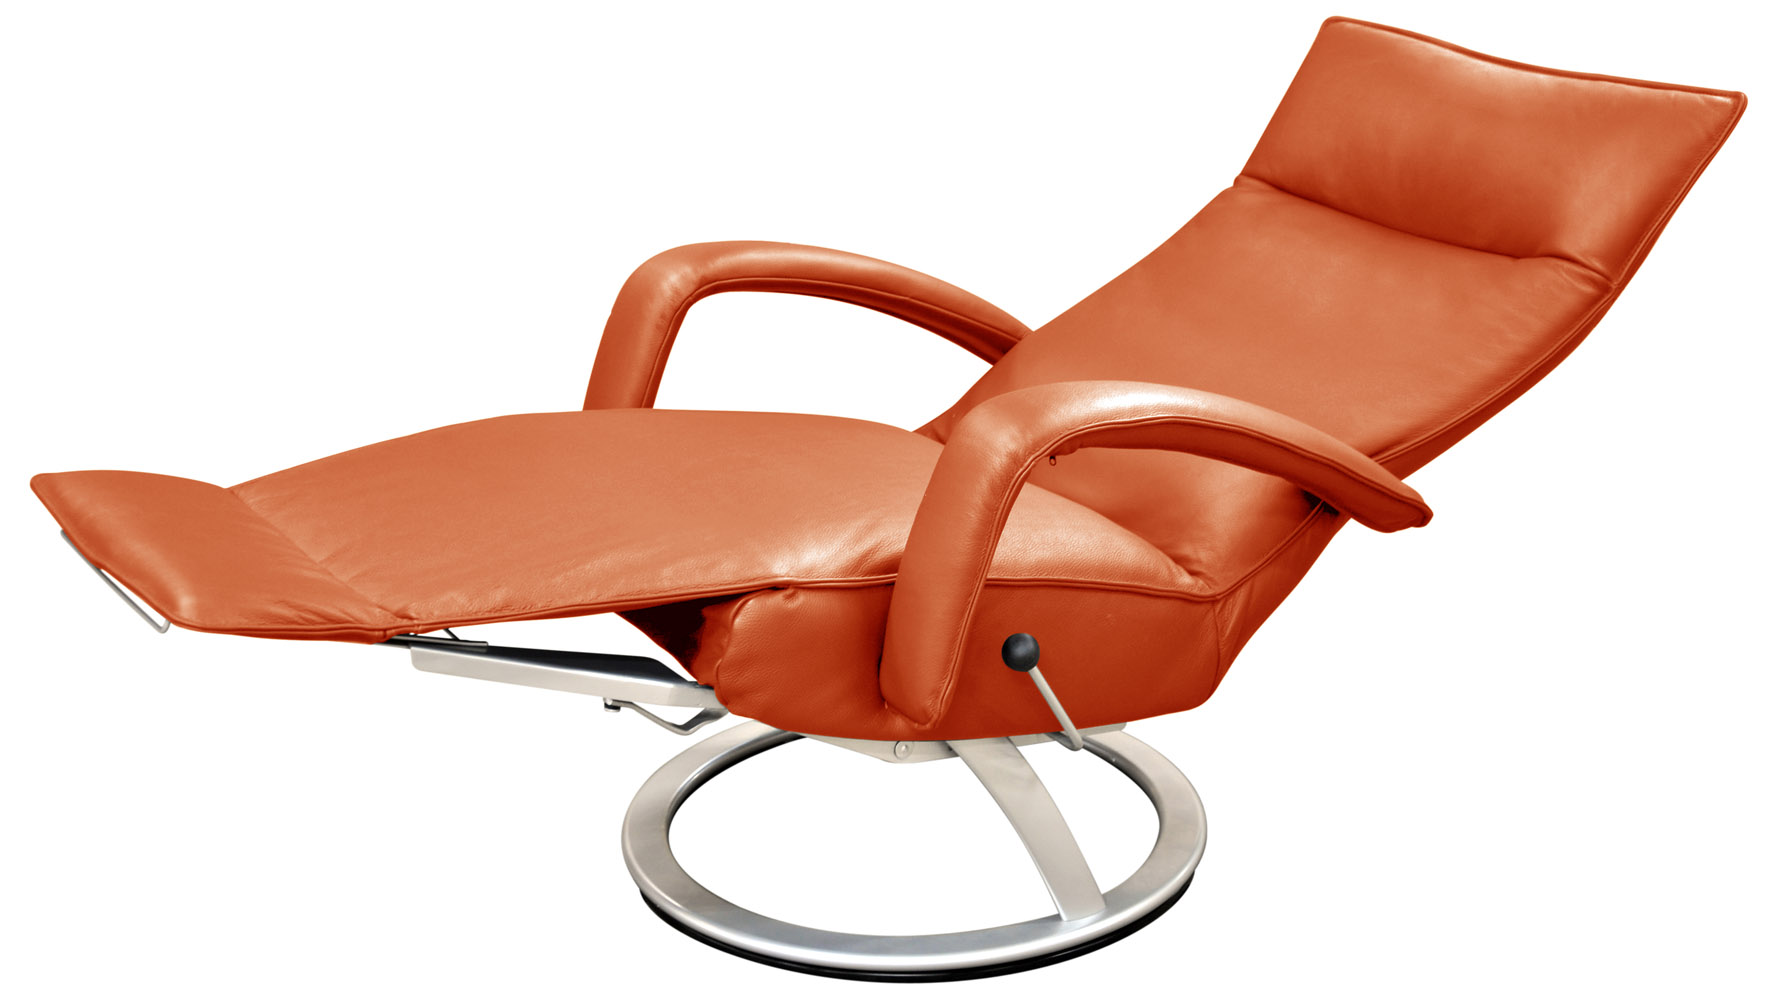 Gaga Recliner  sc 1 st  Zuri Furniture & Gaga Leather Adjustable Reclining Chair | Zuri Furniture islam-shia.org